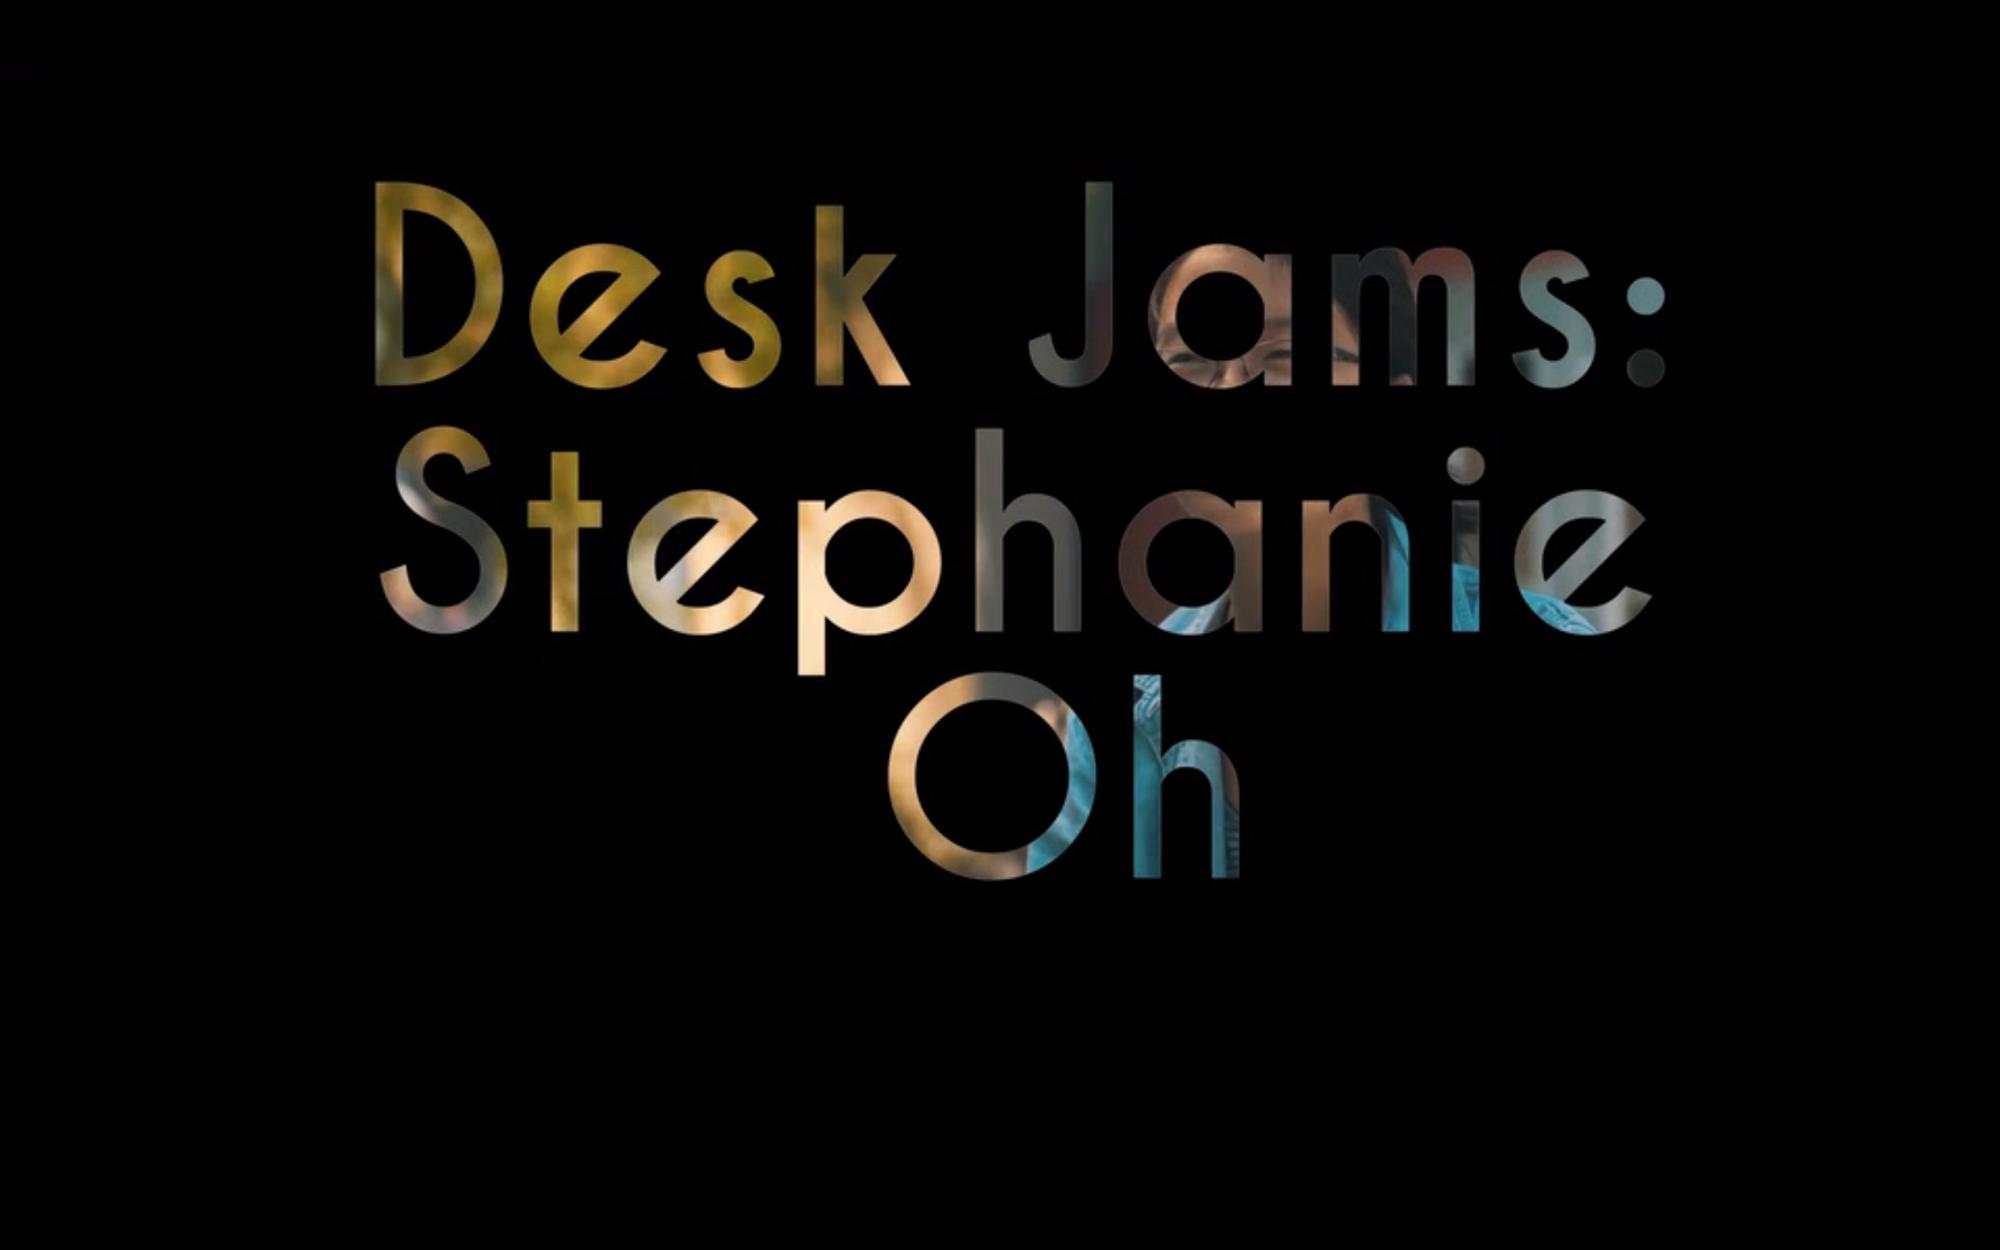 Desk Jams: Edition 11 – Stephanie Oh